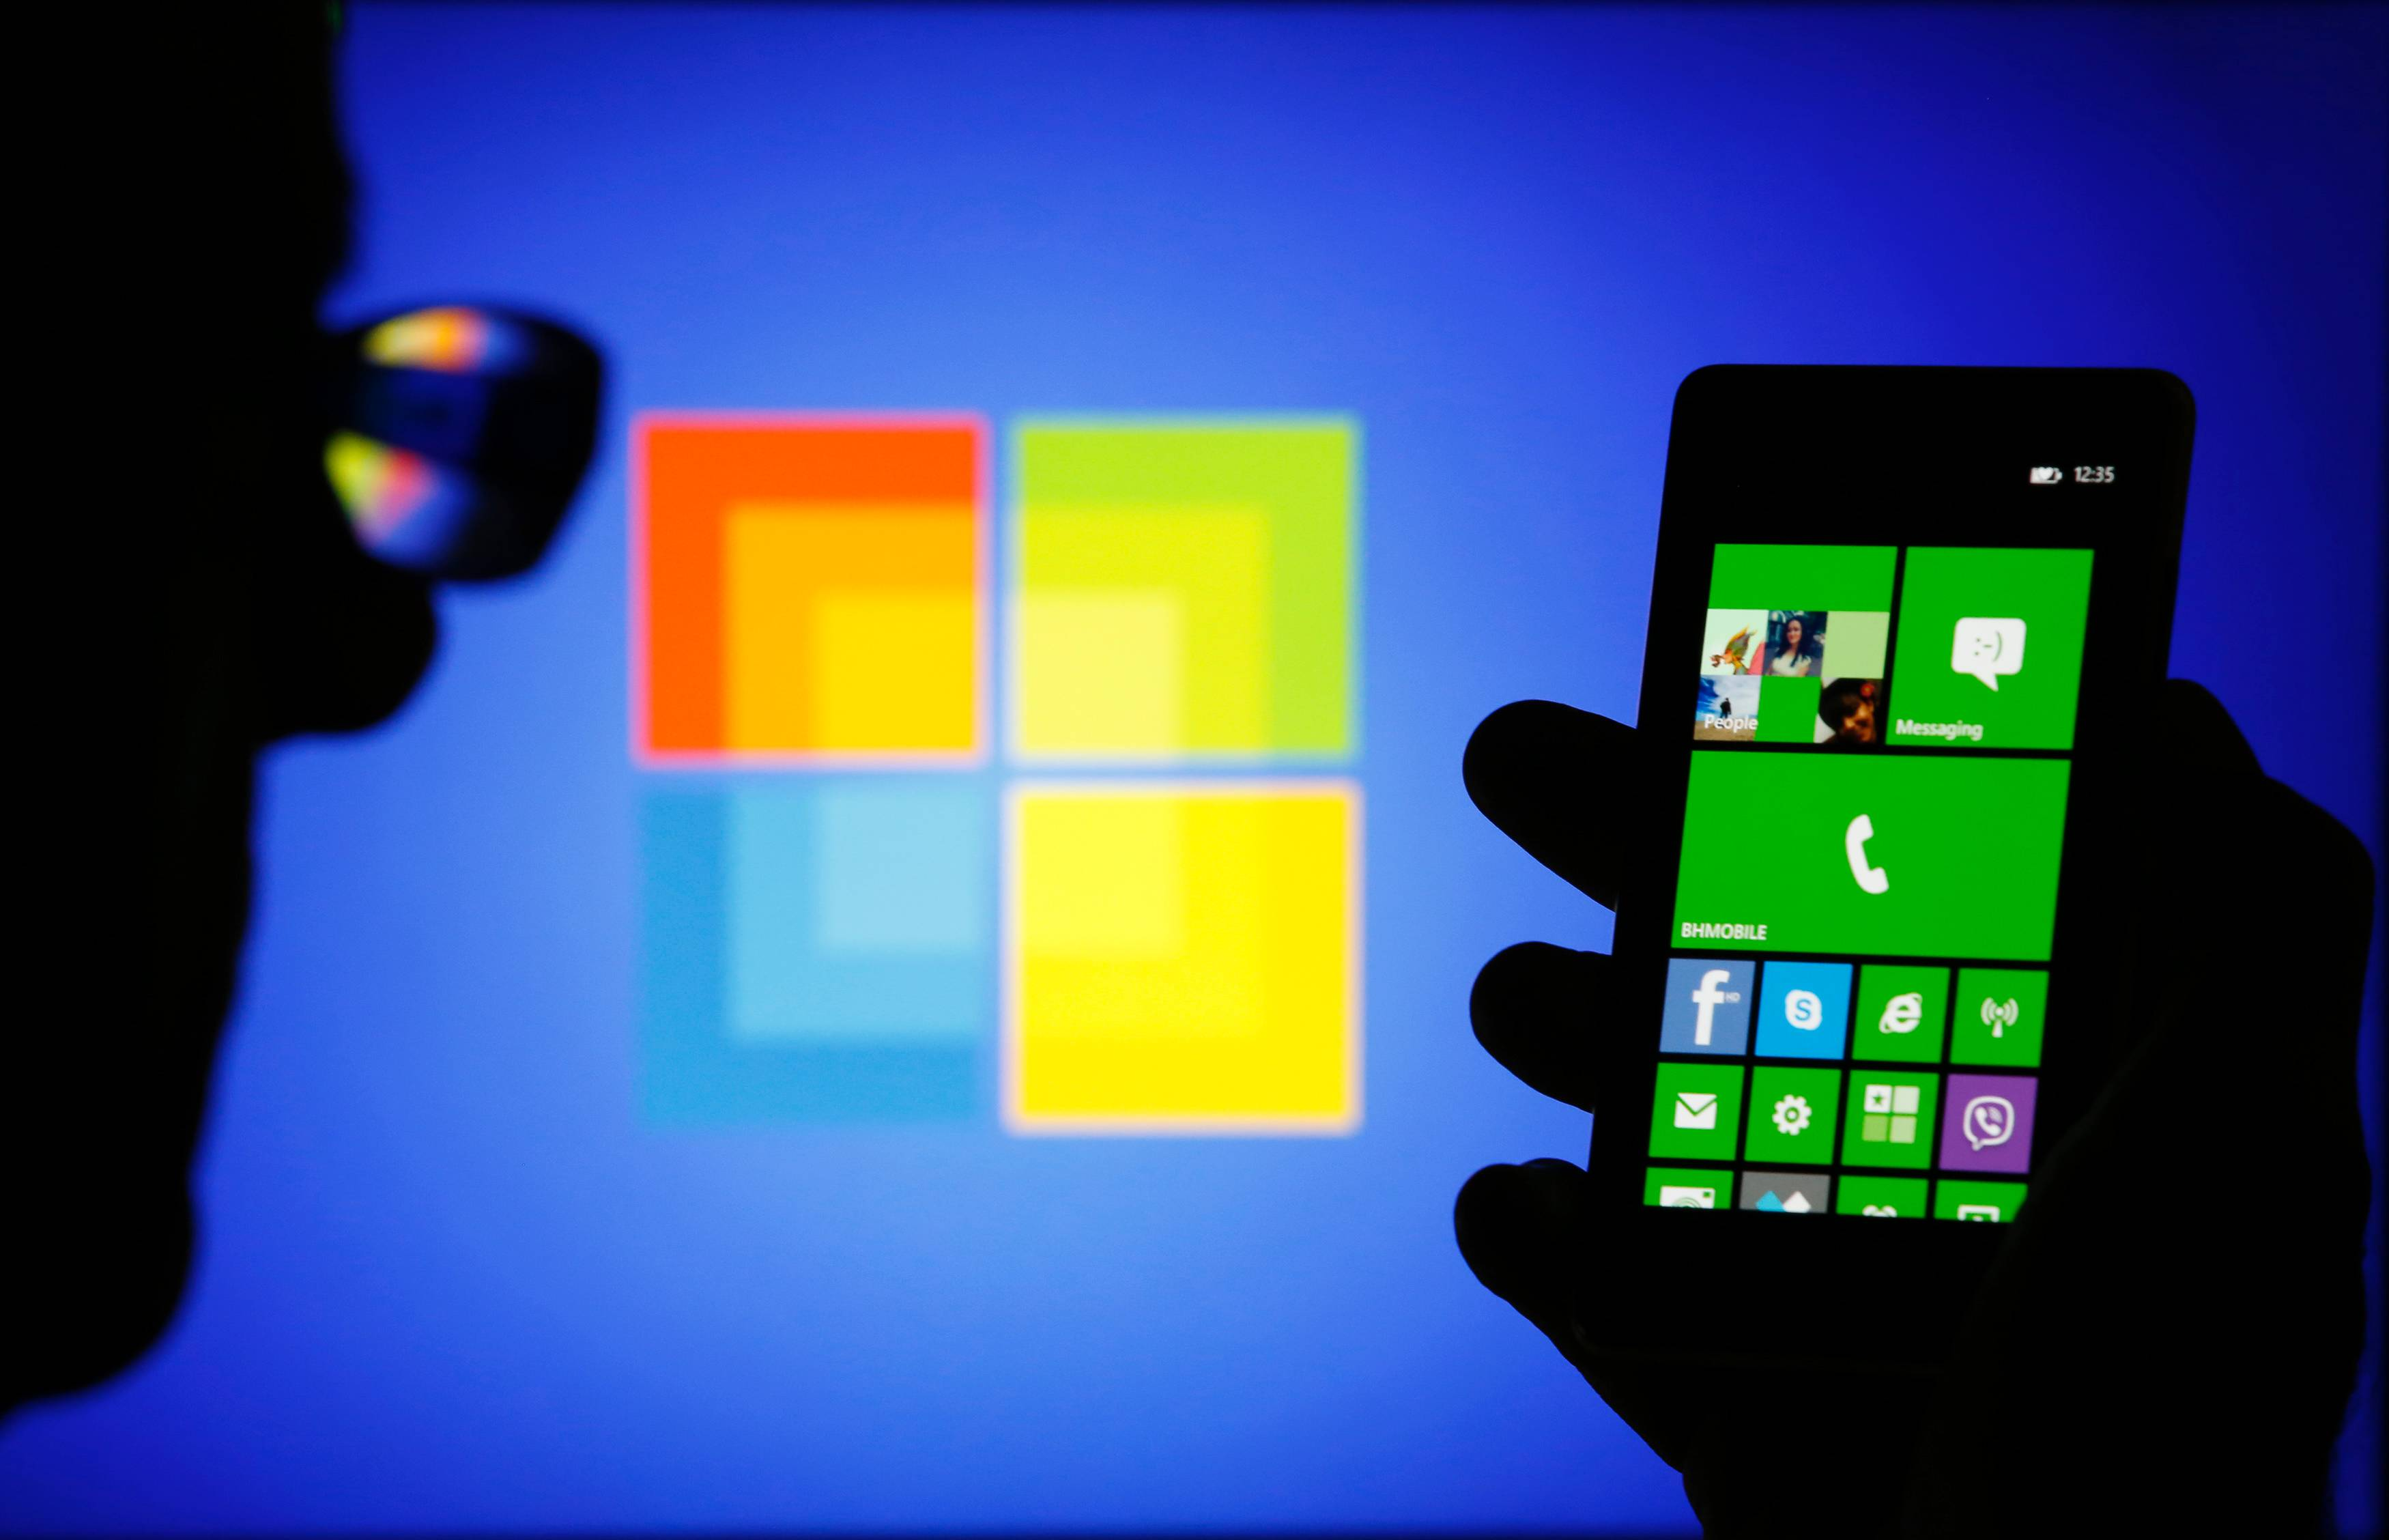 nokia big2 - Thâu tóm Nokia: Microsoft liệu có nuốt trôi?